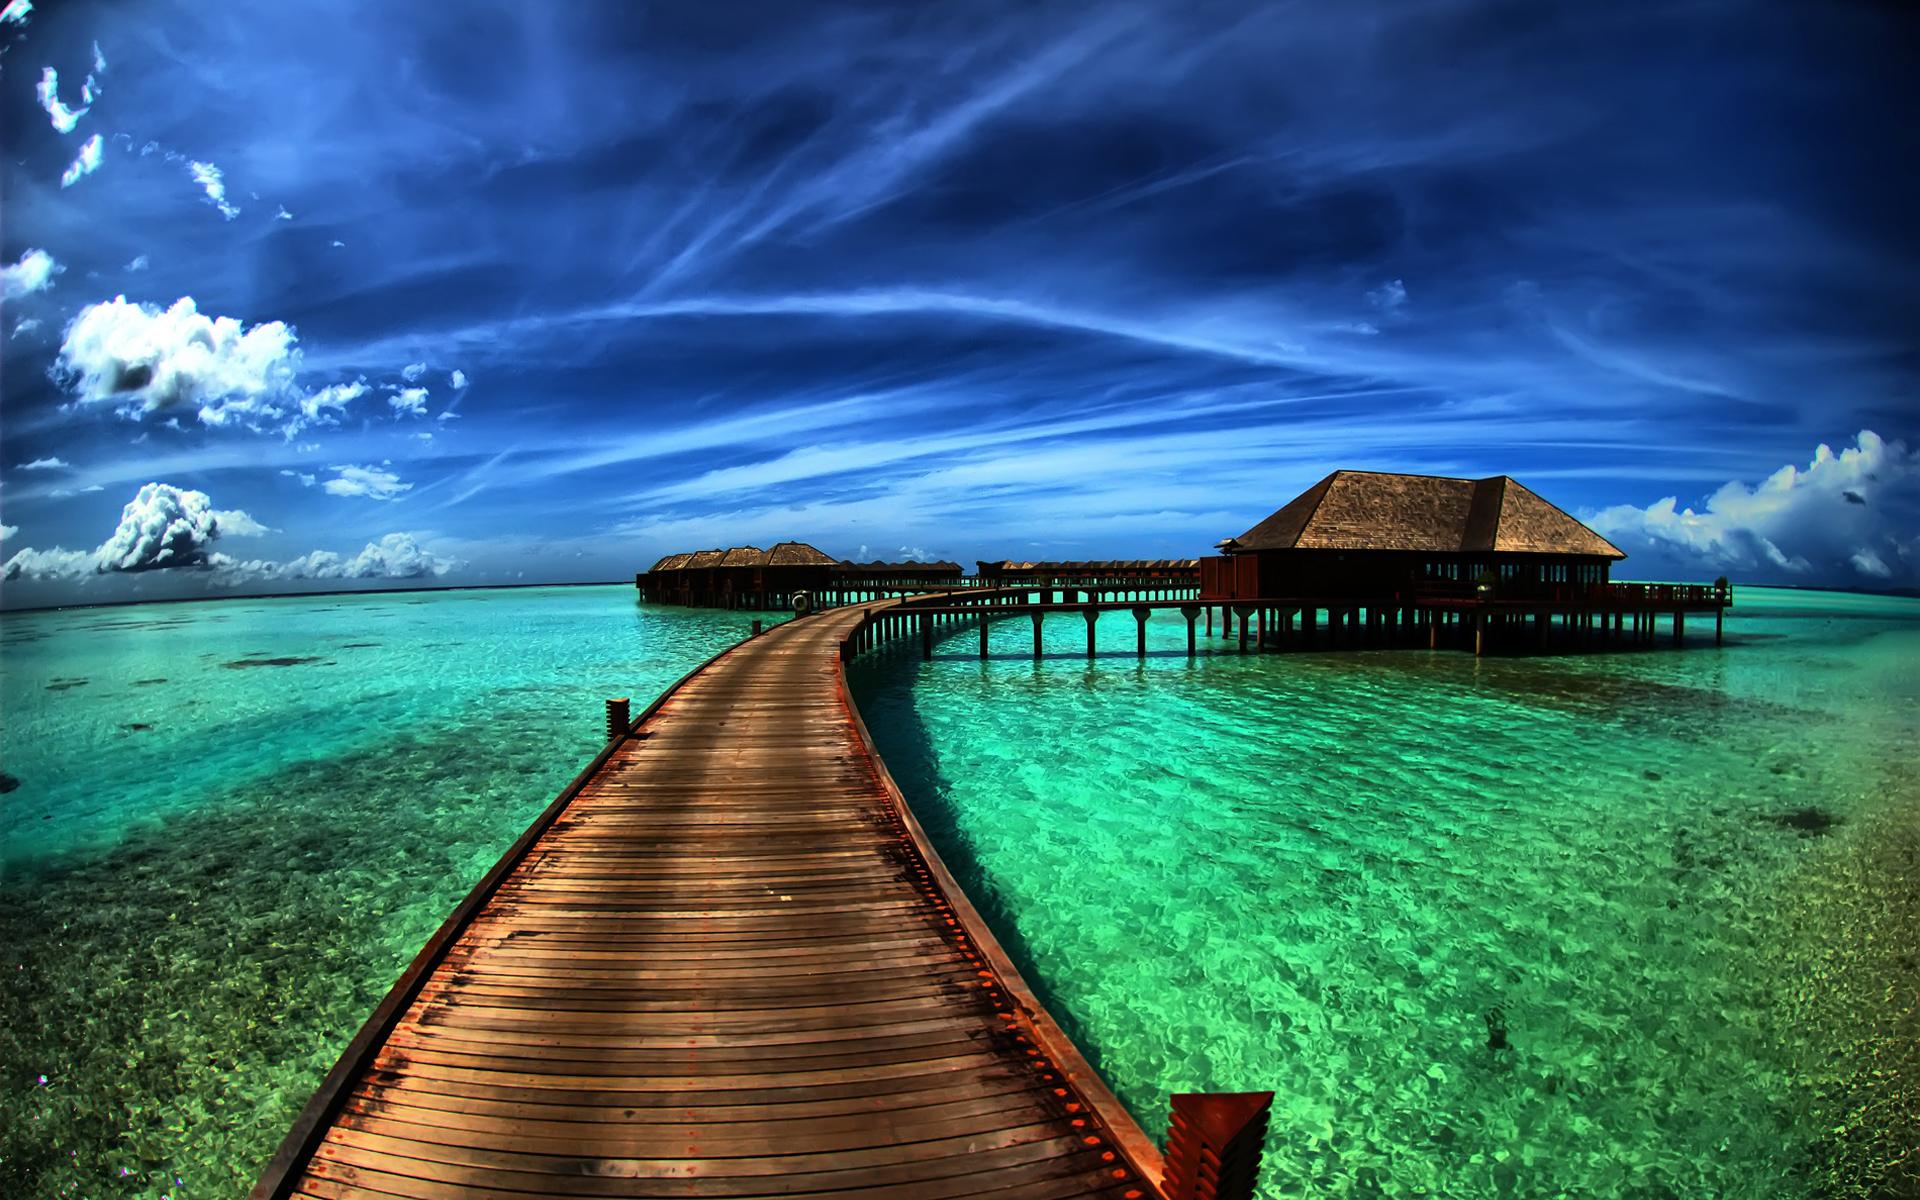 Holiday Ocean Resort Sky Tropical 1920x1200